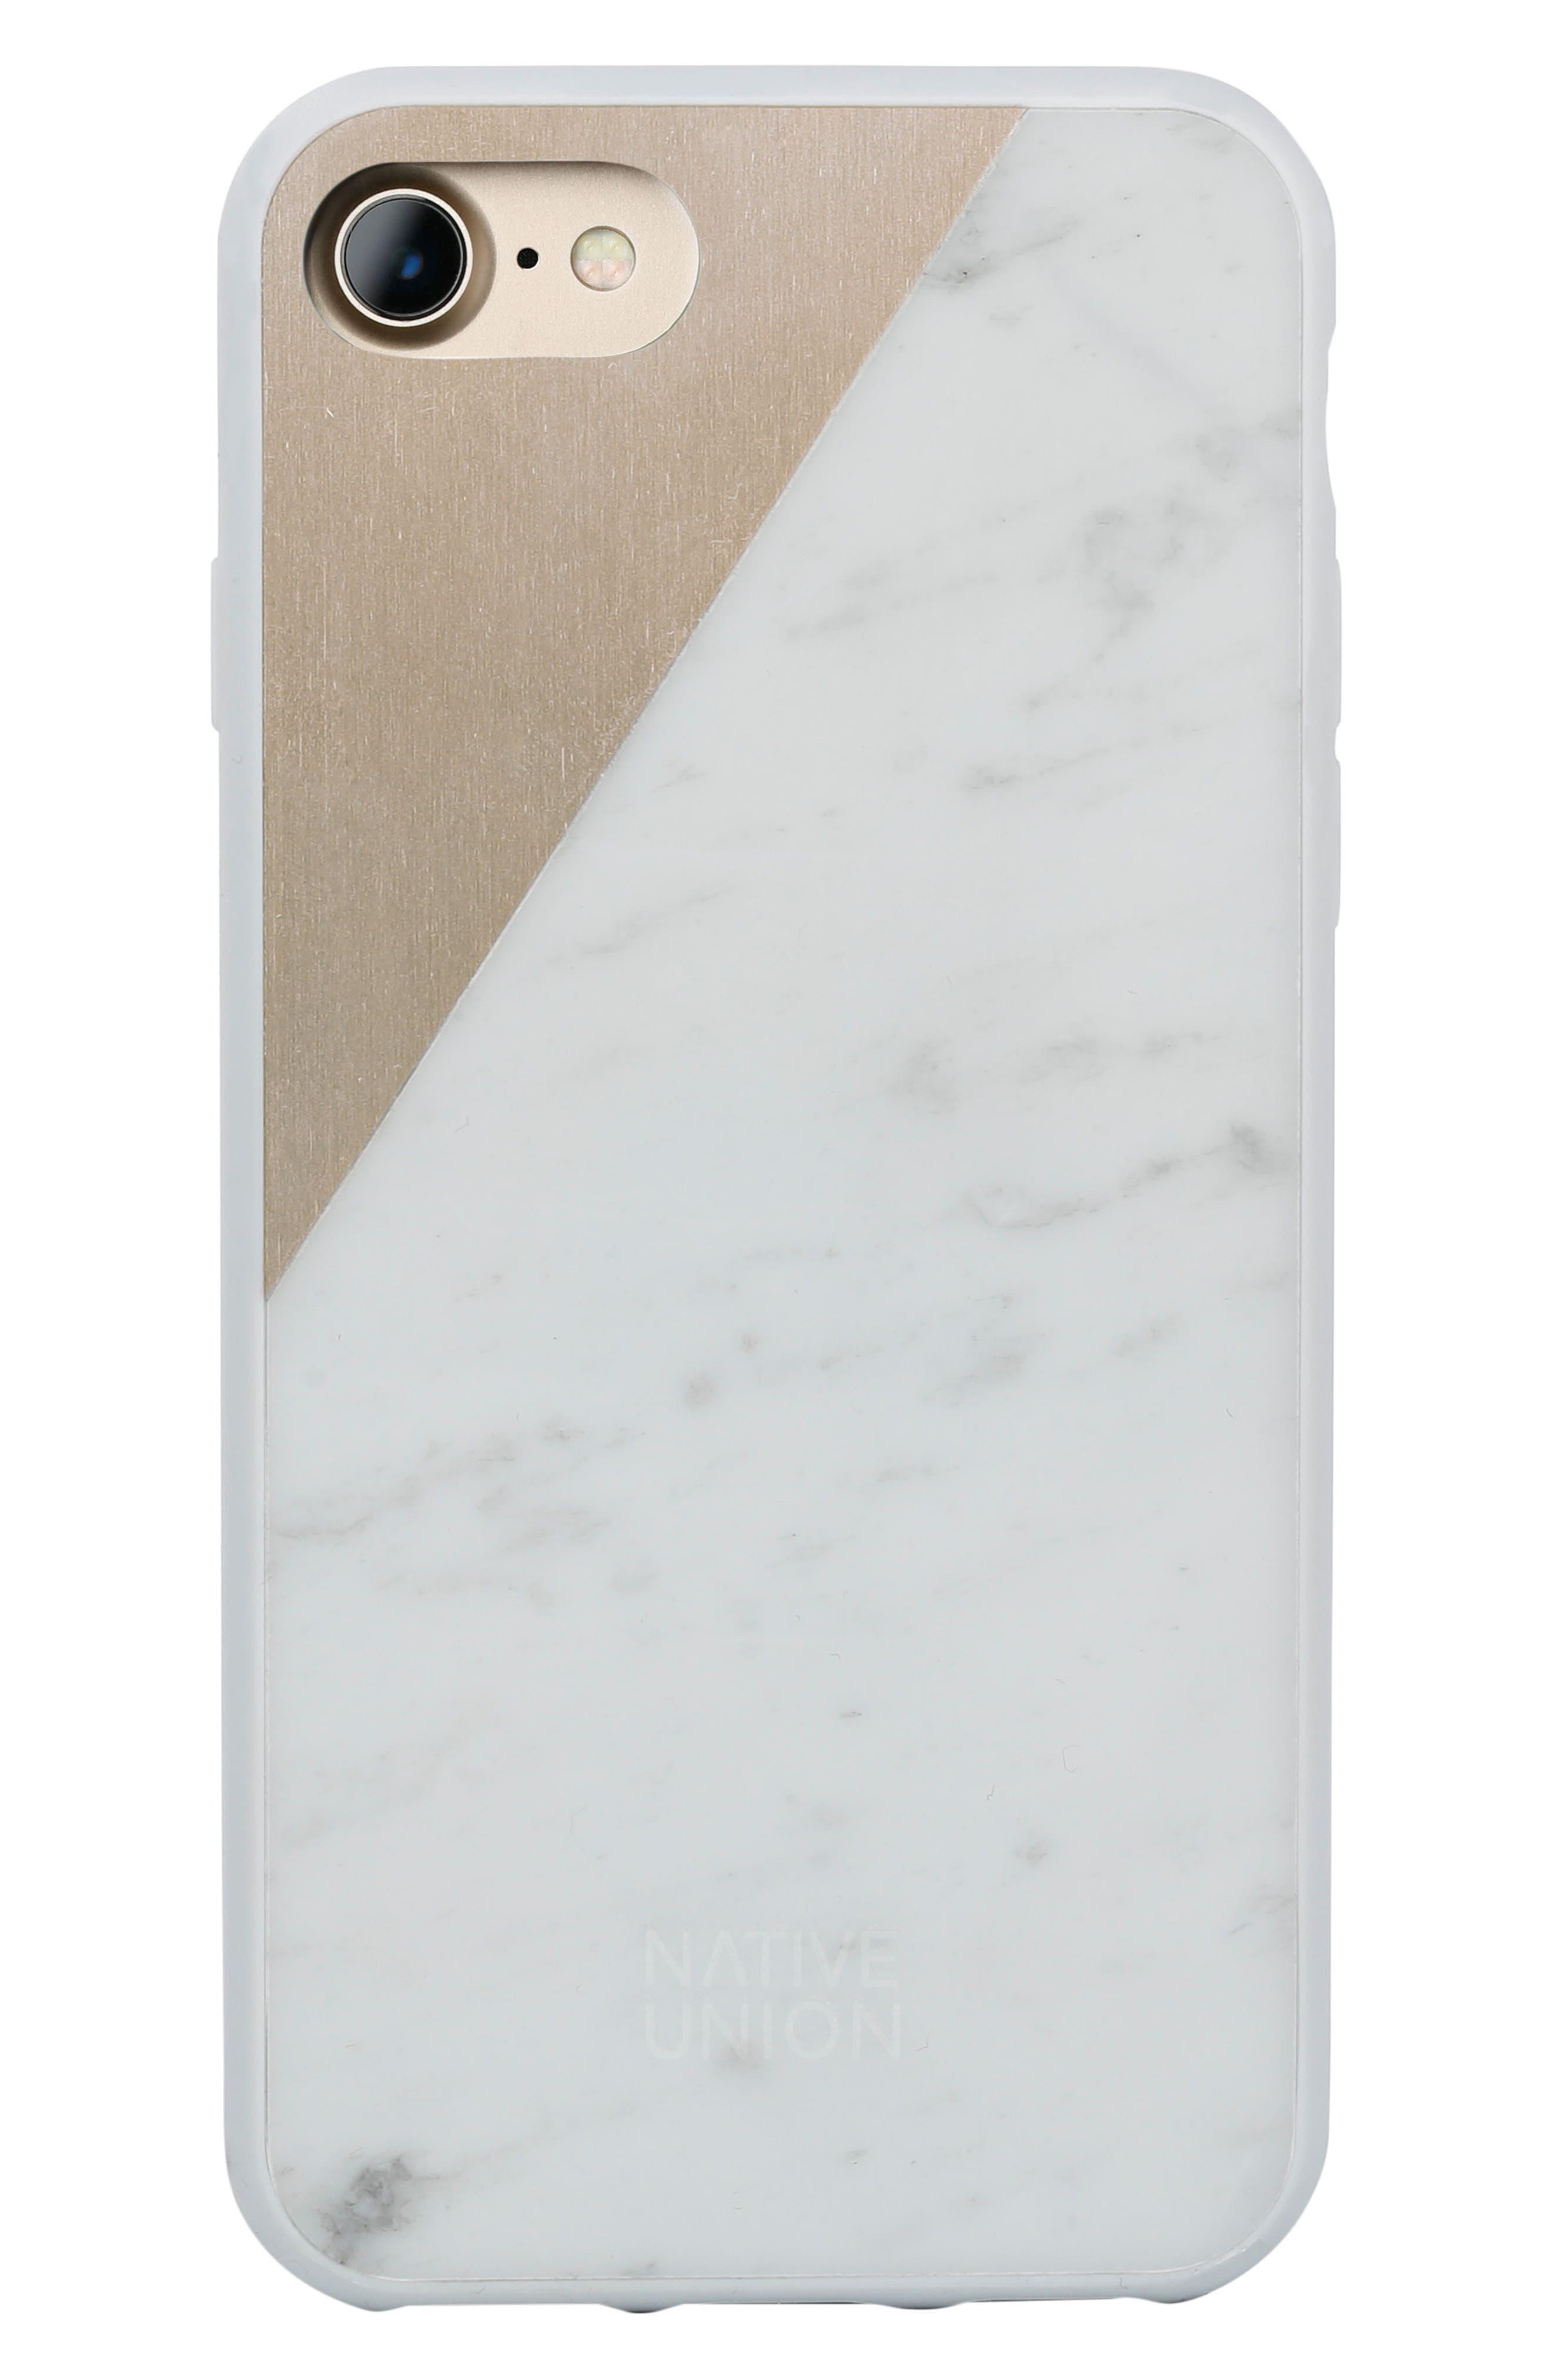 Native Union CLIC Marble iPhone 7 & 7 Plus Case